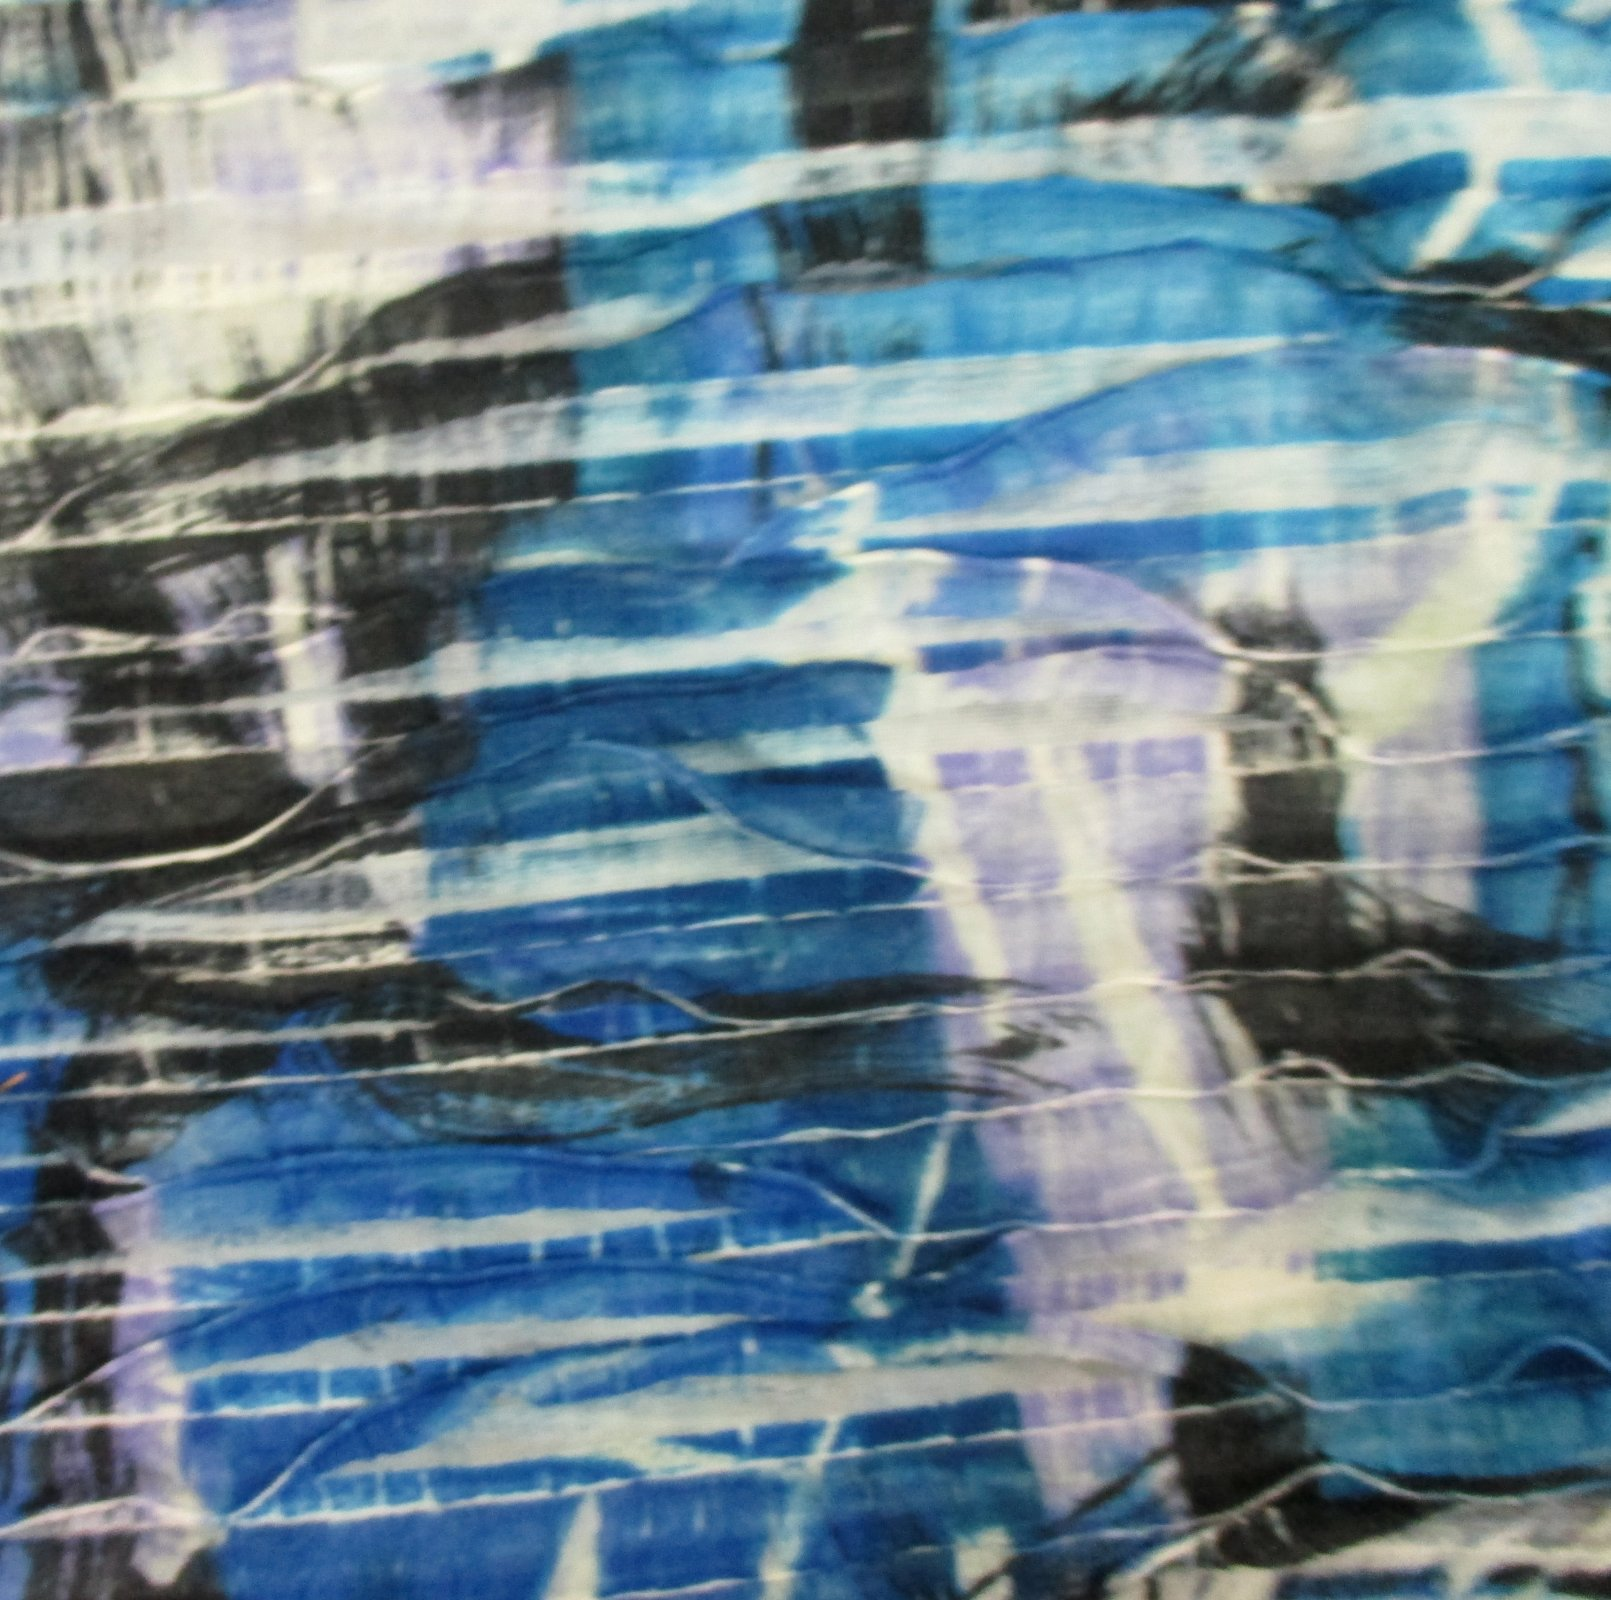 Fashion Ruffle Print - Blue